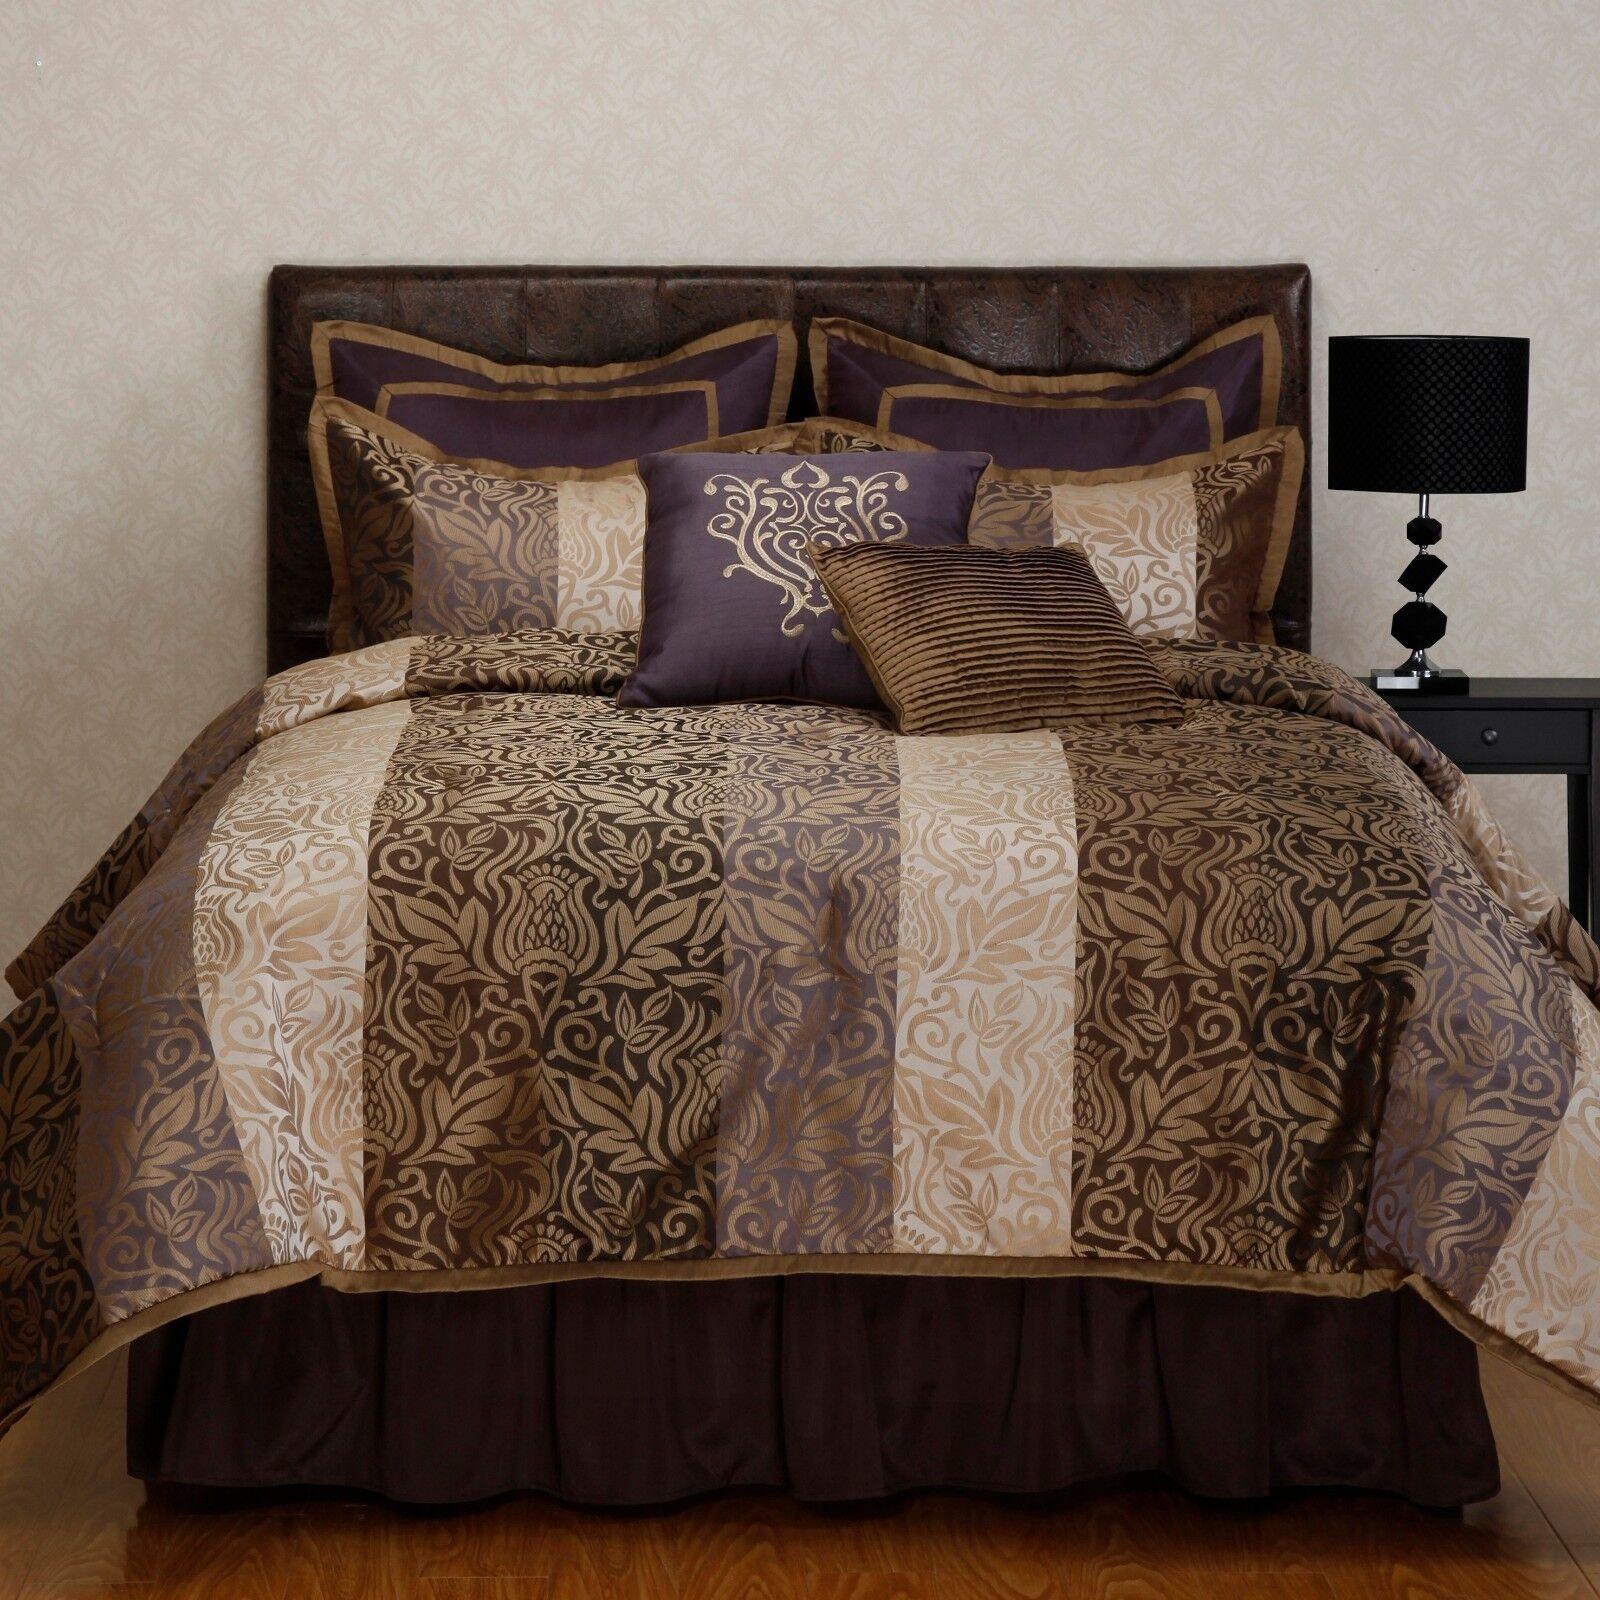 Laurence Tan Jacquard 8-piece Oversize Comforter Set